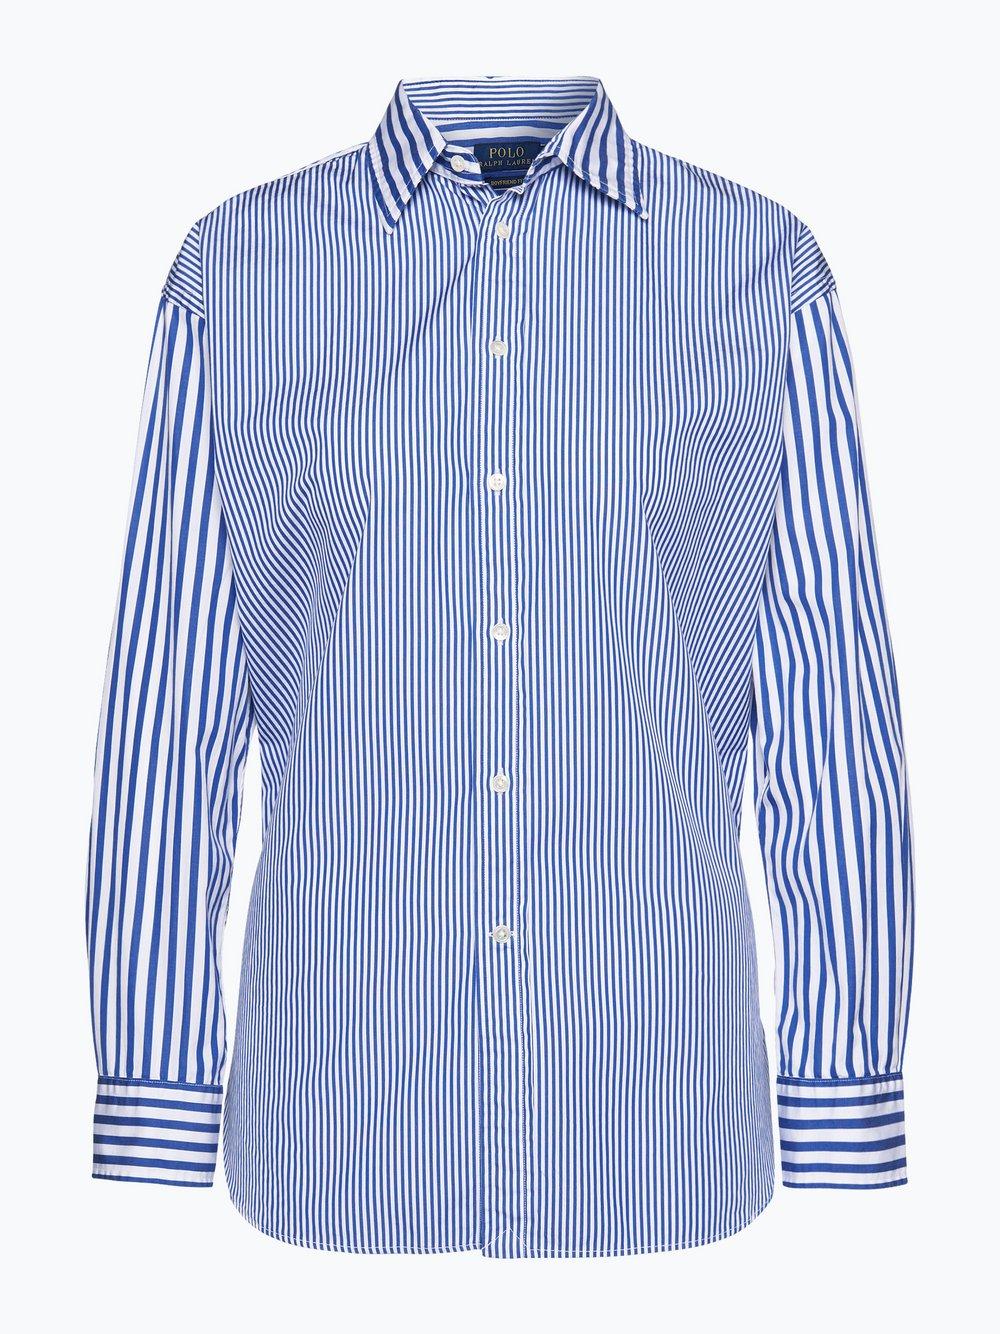 3e246080d889 Polo Ralph Lauren Damen Bluse - Ellen  2  online kaufen   PEEK-UND ...